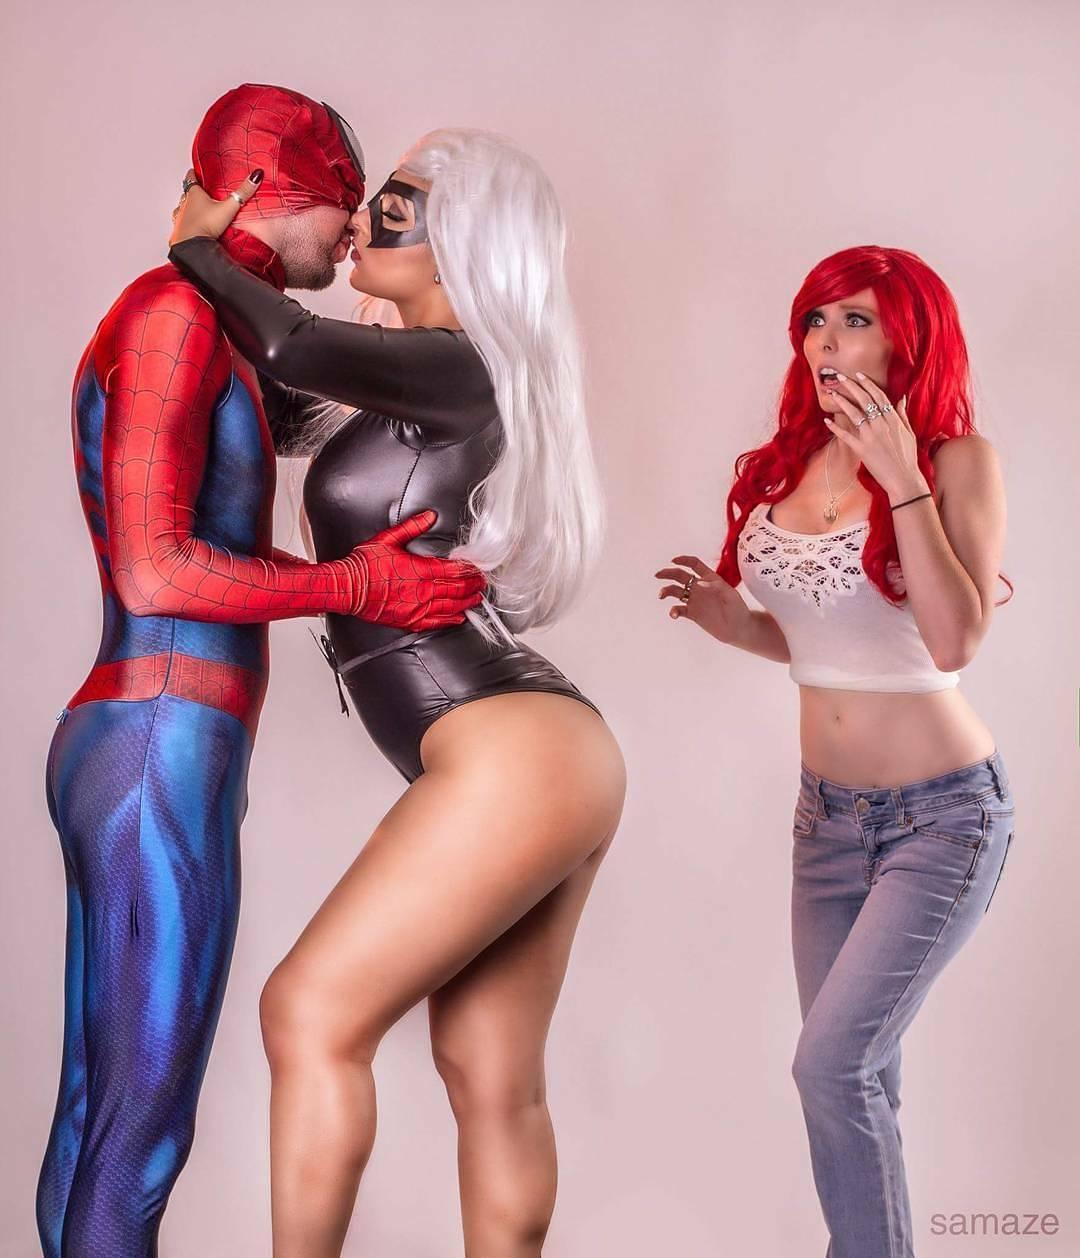 spiderman blackcat mjwatson cosplay by dallas_spidey soniaralynn krystlestarrwars photo by adamsamaze